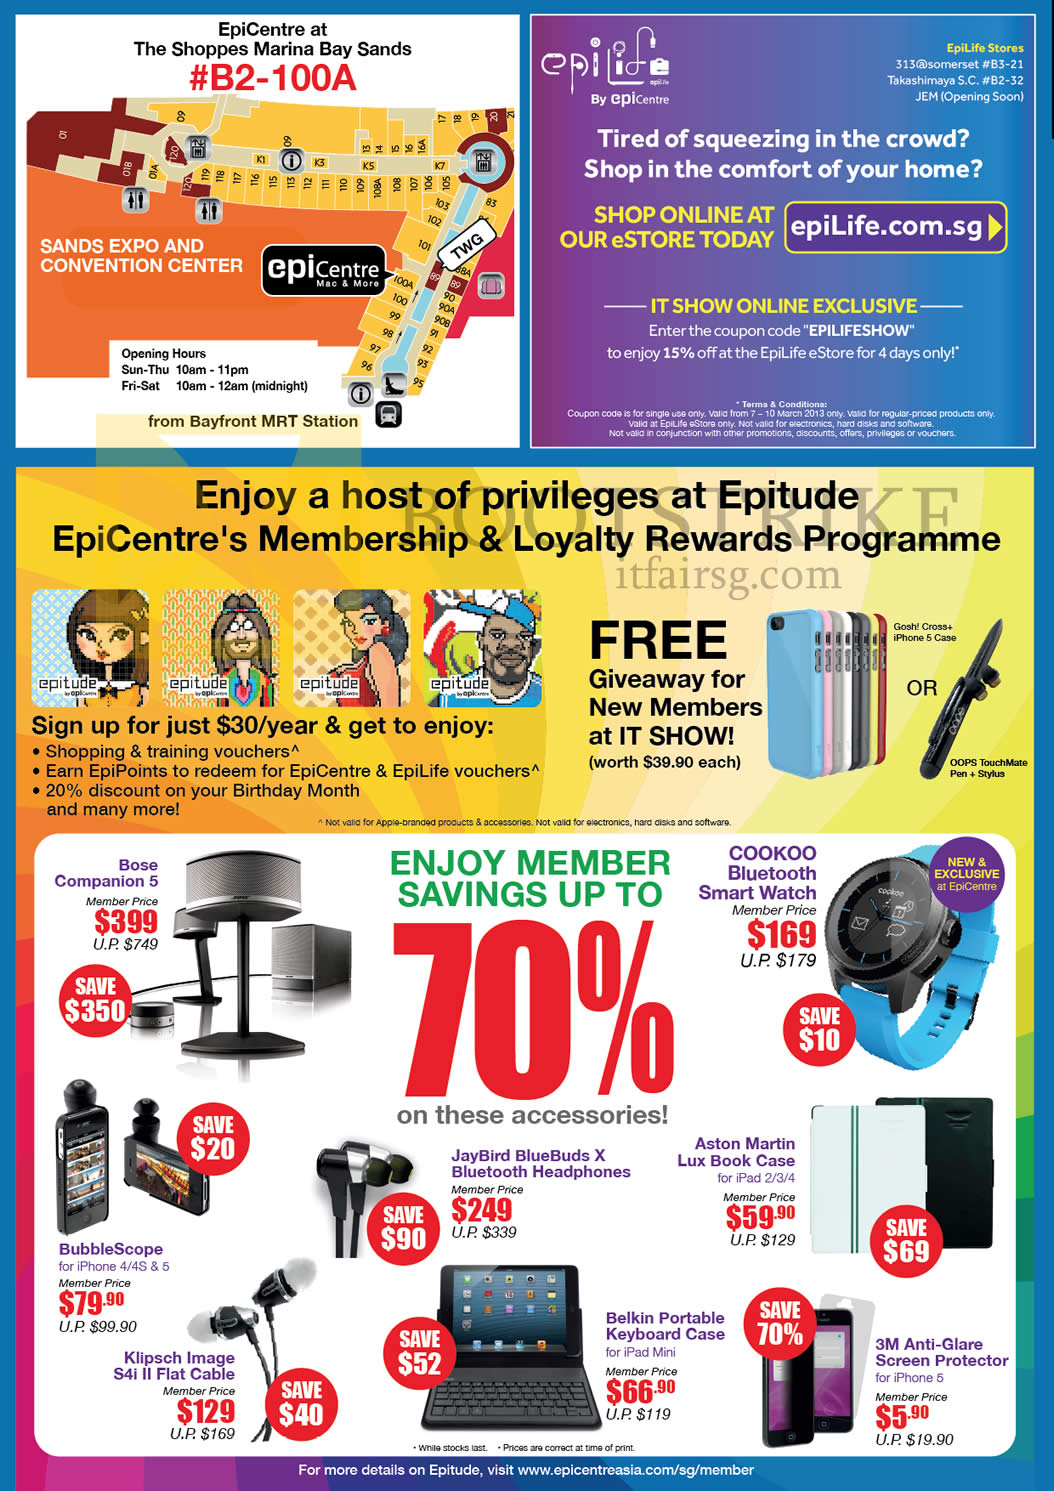 IT SHOW 2013 price list image brochure of EpiCentre Epitude Membership Loyalty Rewards Programme